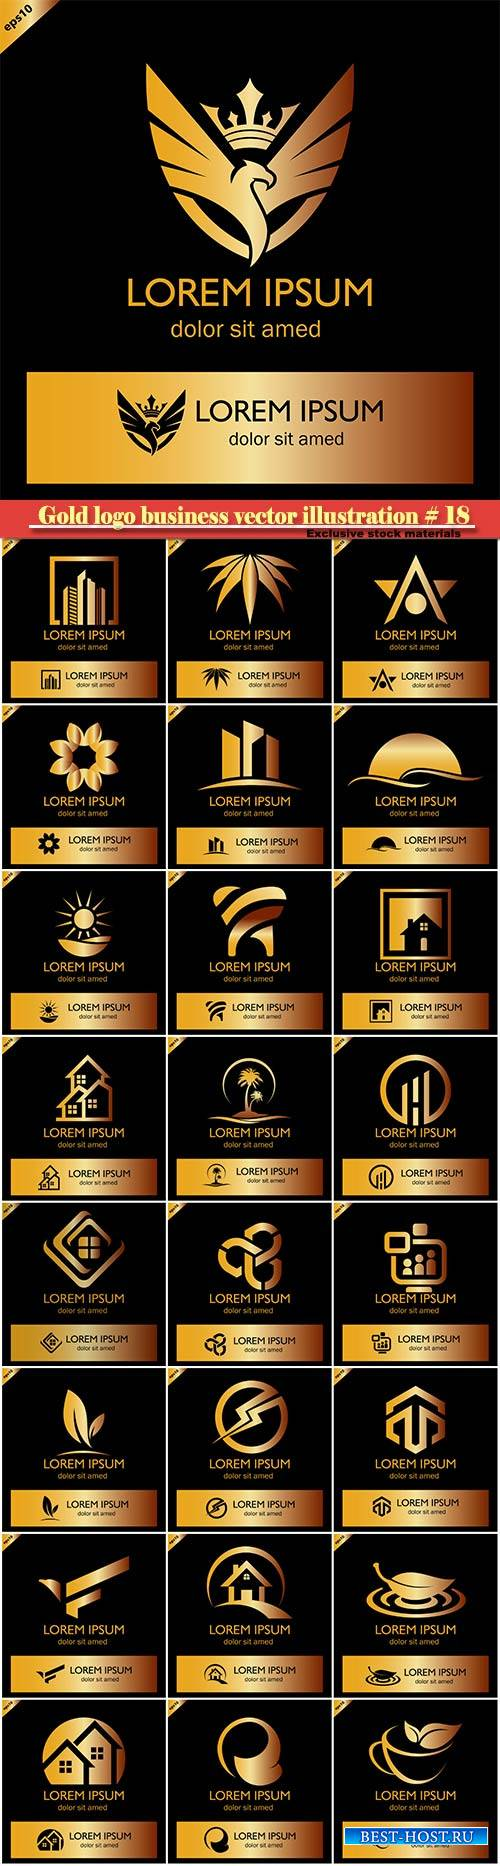 Gold logo business vector illustration # 18